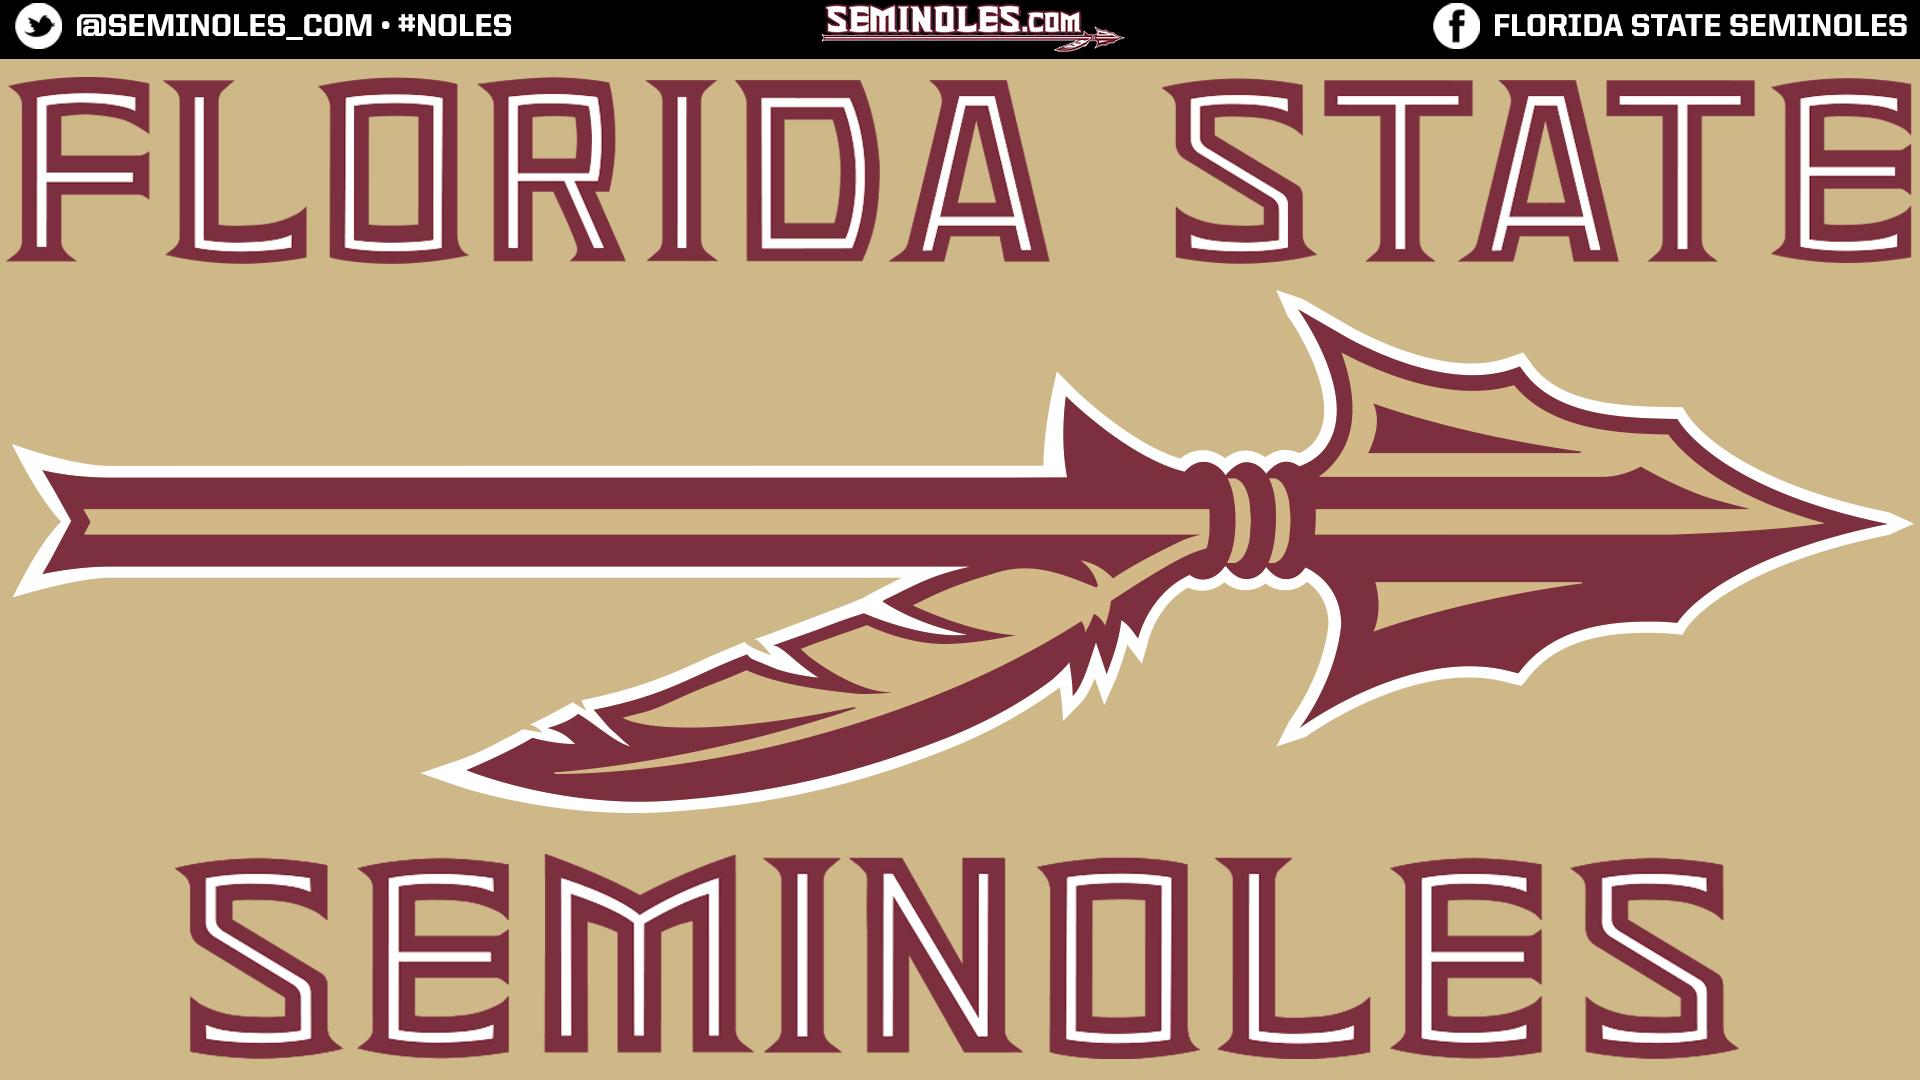 SEMINOLESCOM DESKTOP WALLPAPERS   Florida State Seminoles Official 1920x1080